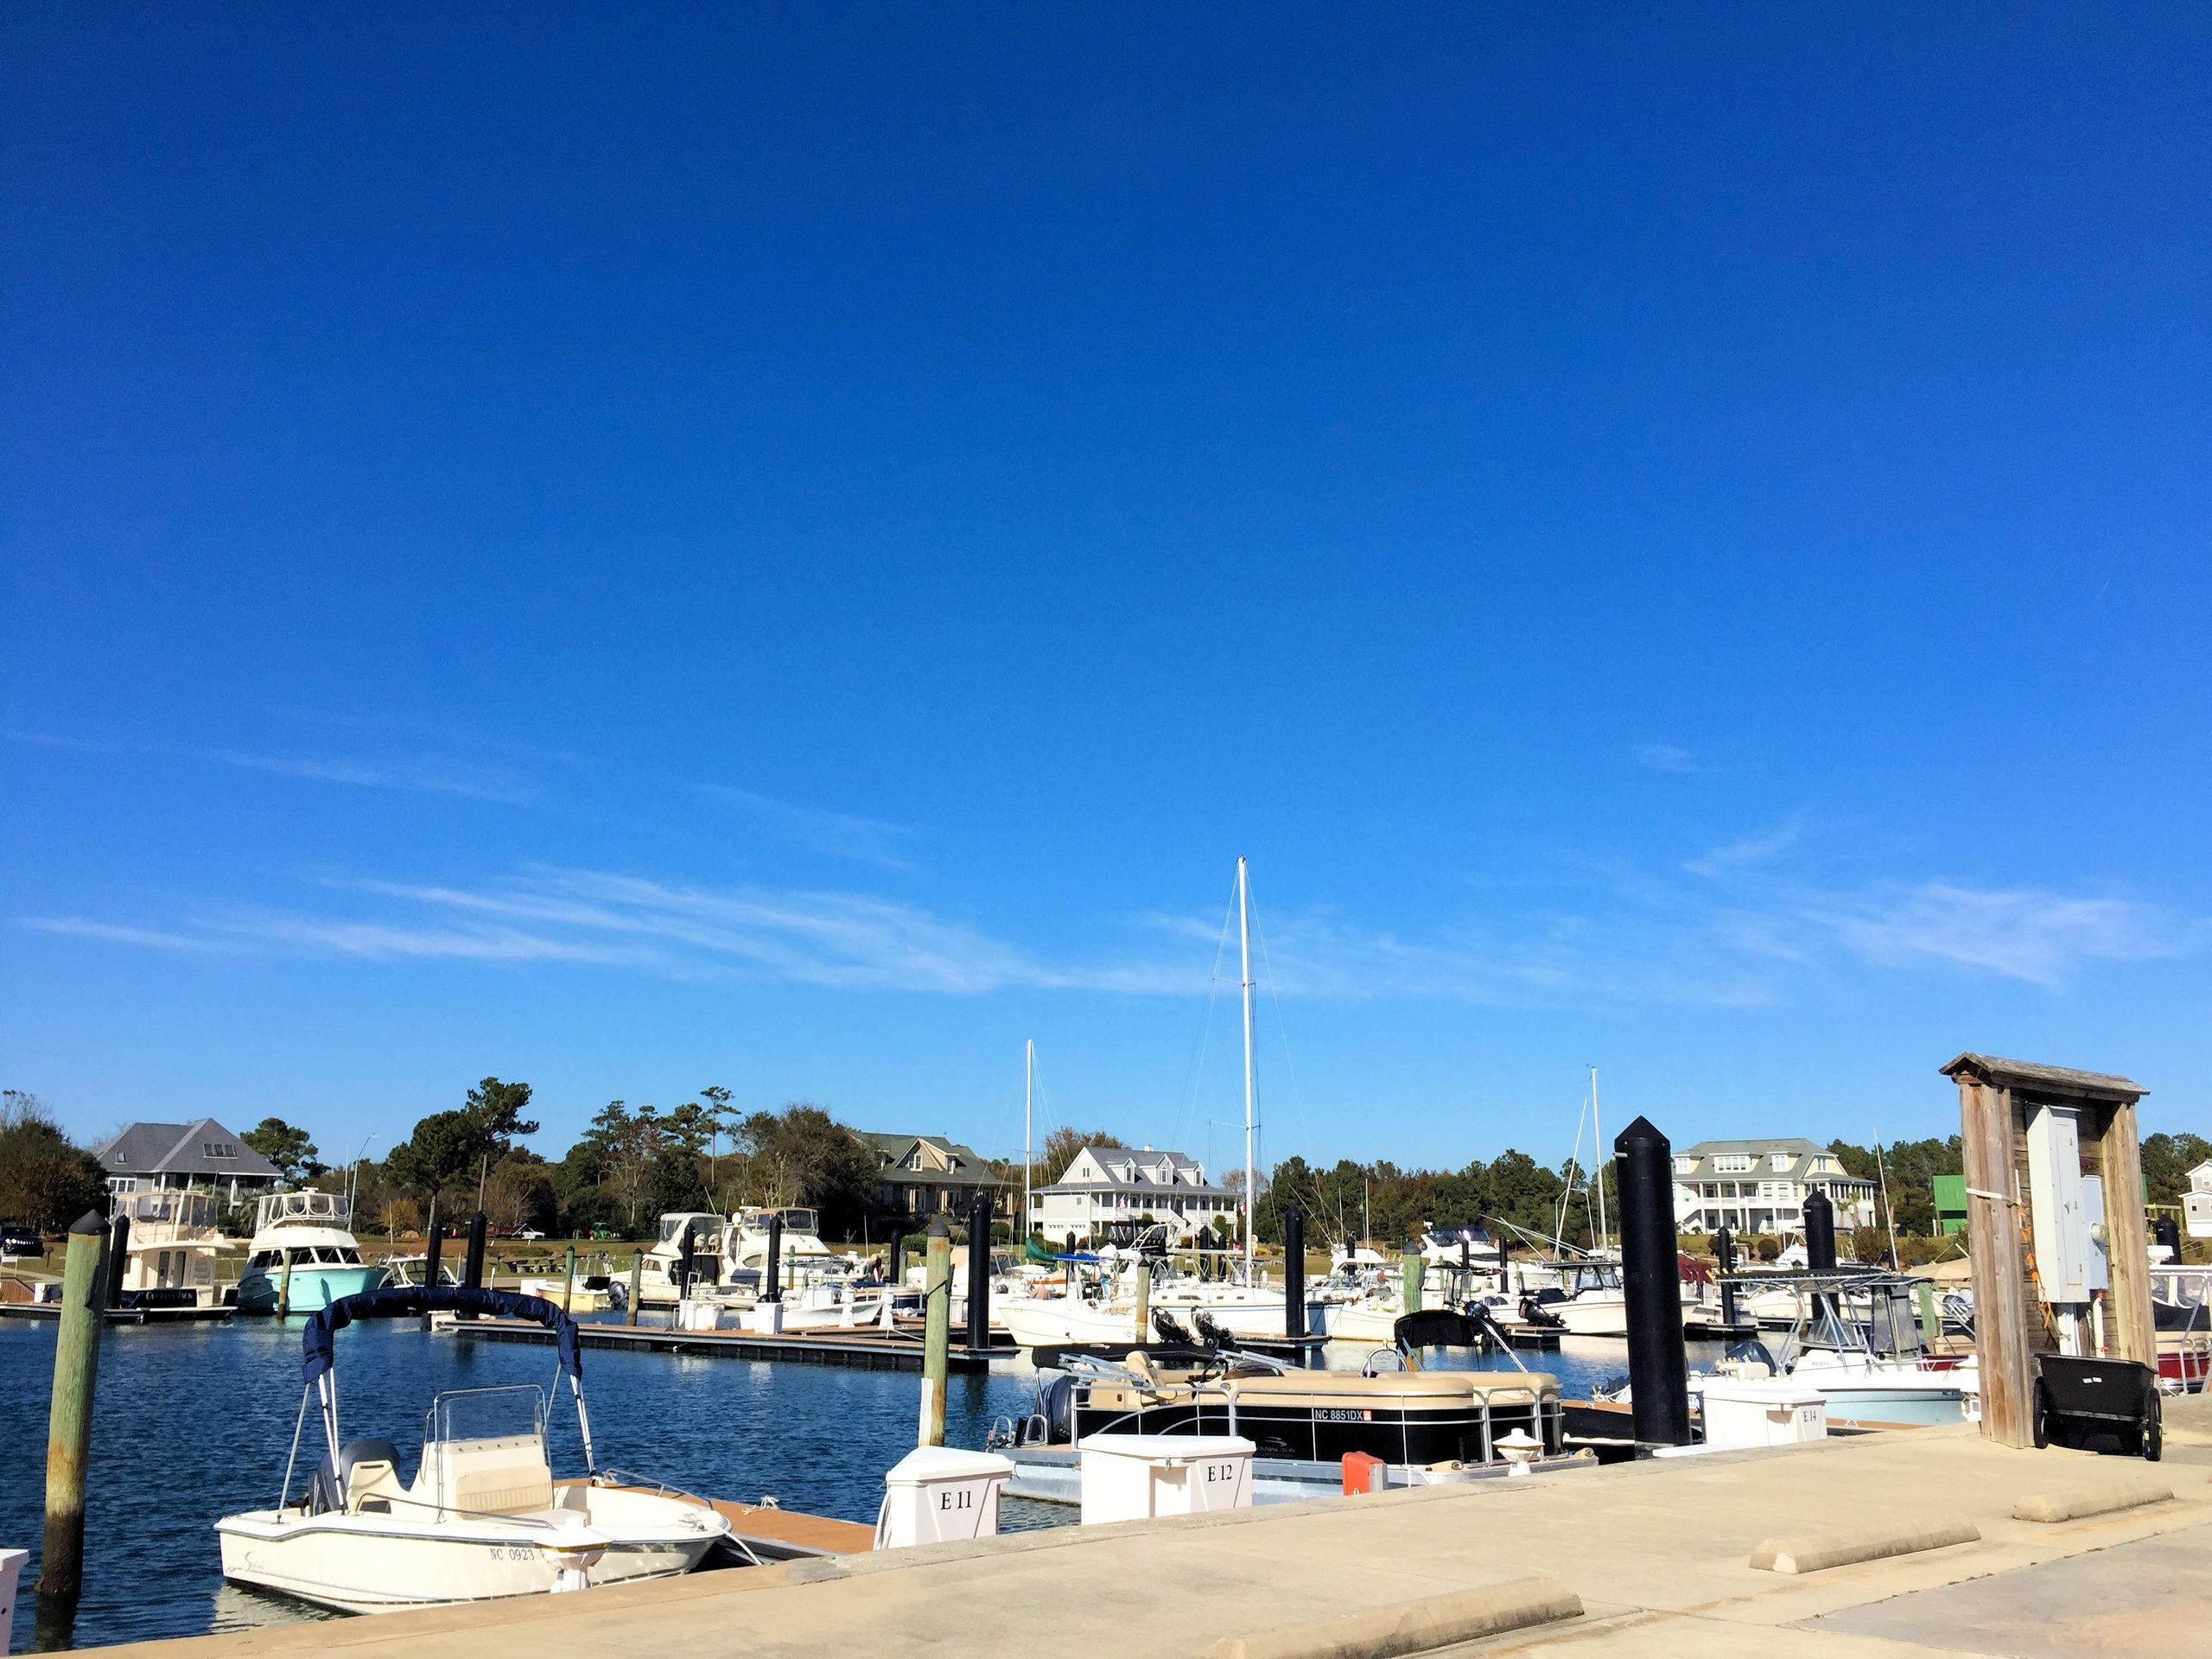 Harbour Village Marina - Marina - The Cameron Team